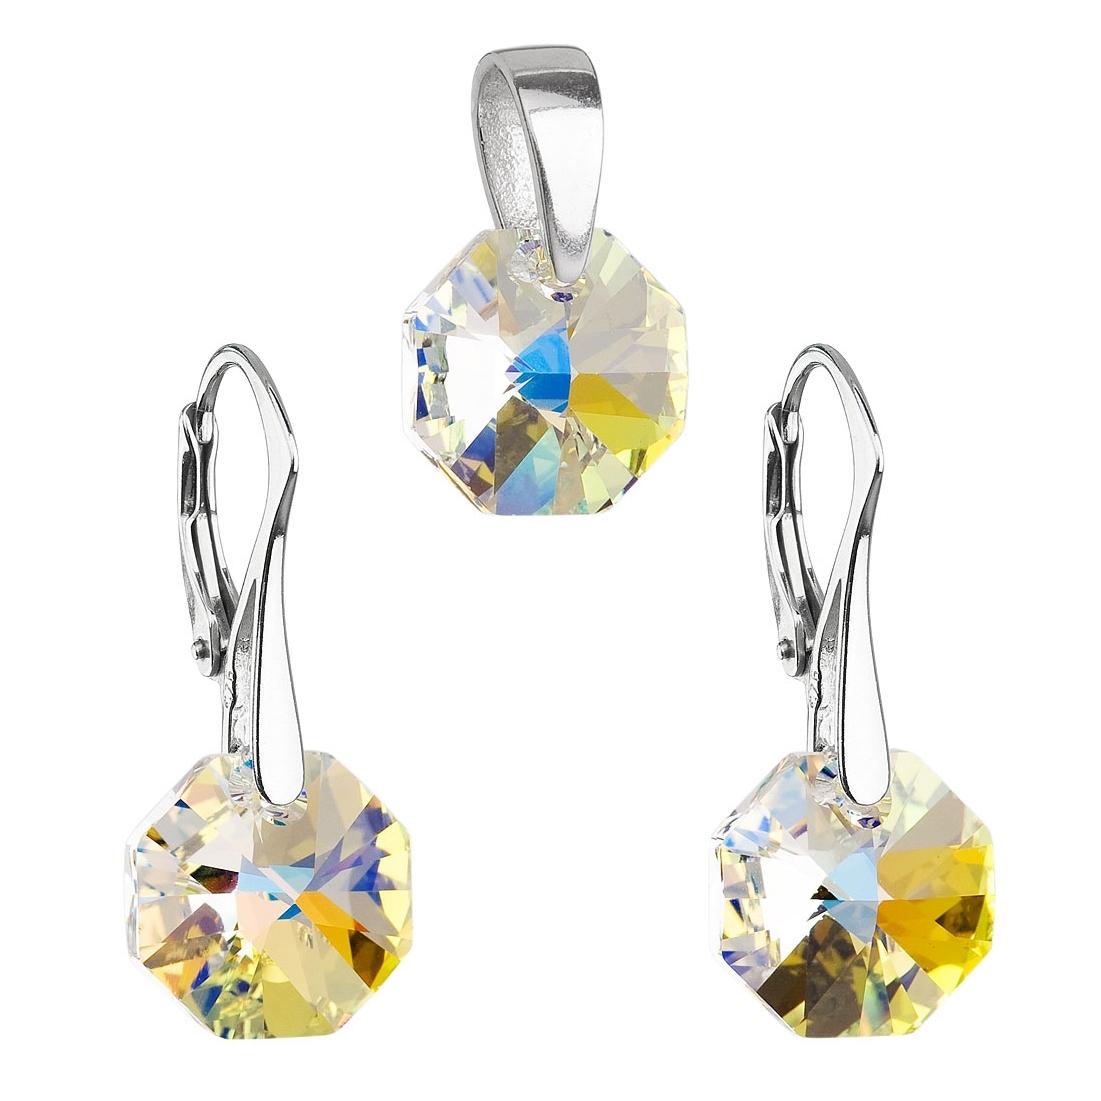 Sada šperků s kameny Crystals from Swarovski® AB EG3029-AB